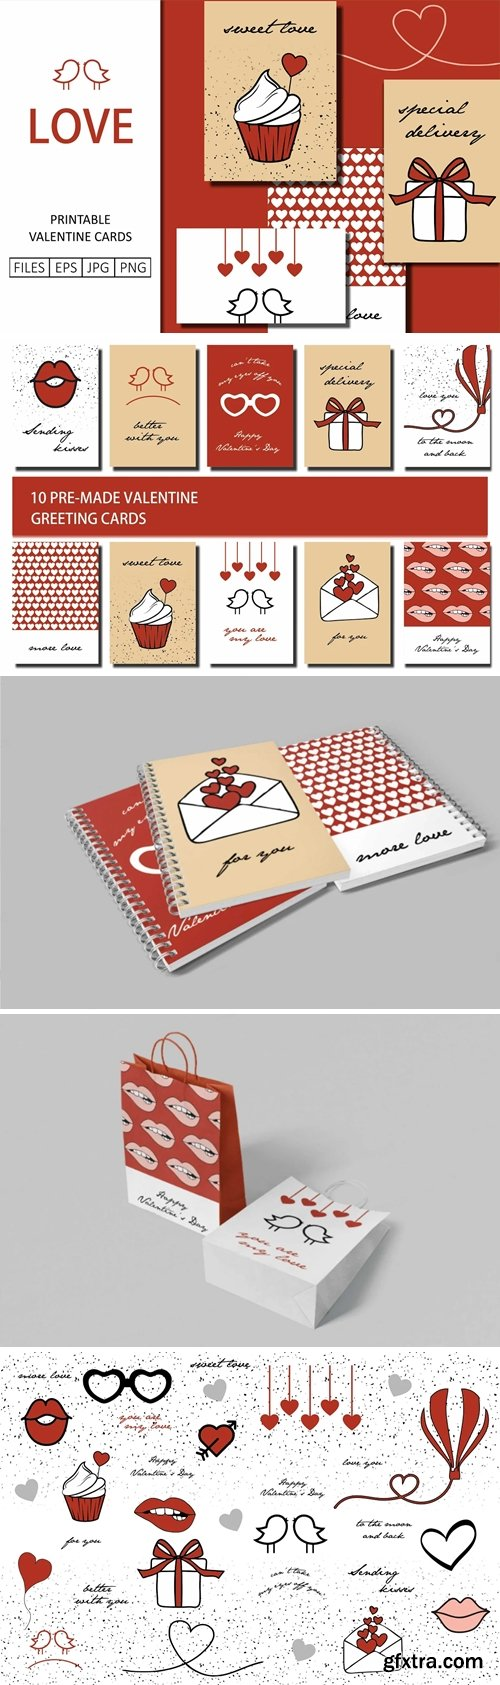 CreativeMarket - Valentine\'s Day Greeting Cards 5783317